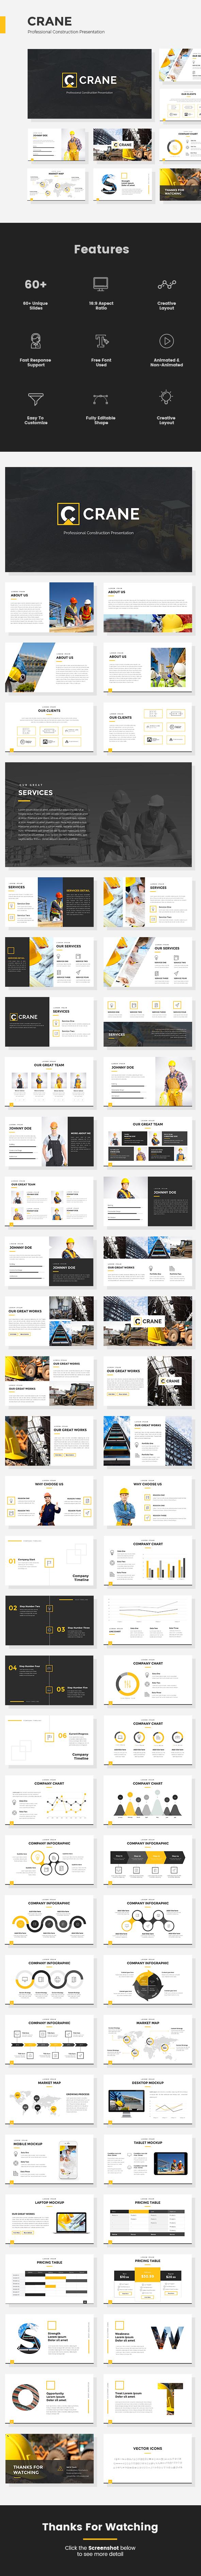 Crane - Professional Construction Powerpoint Presentation